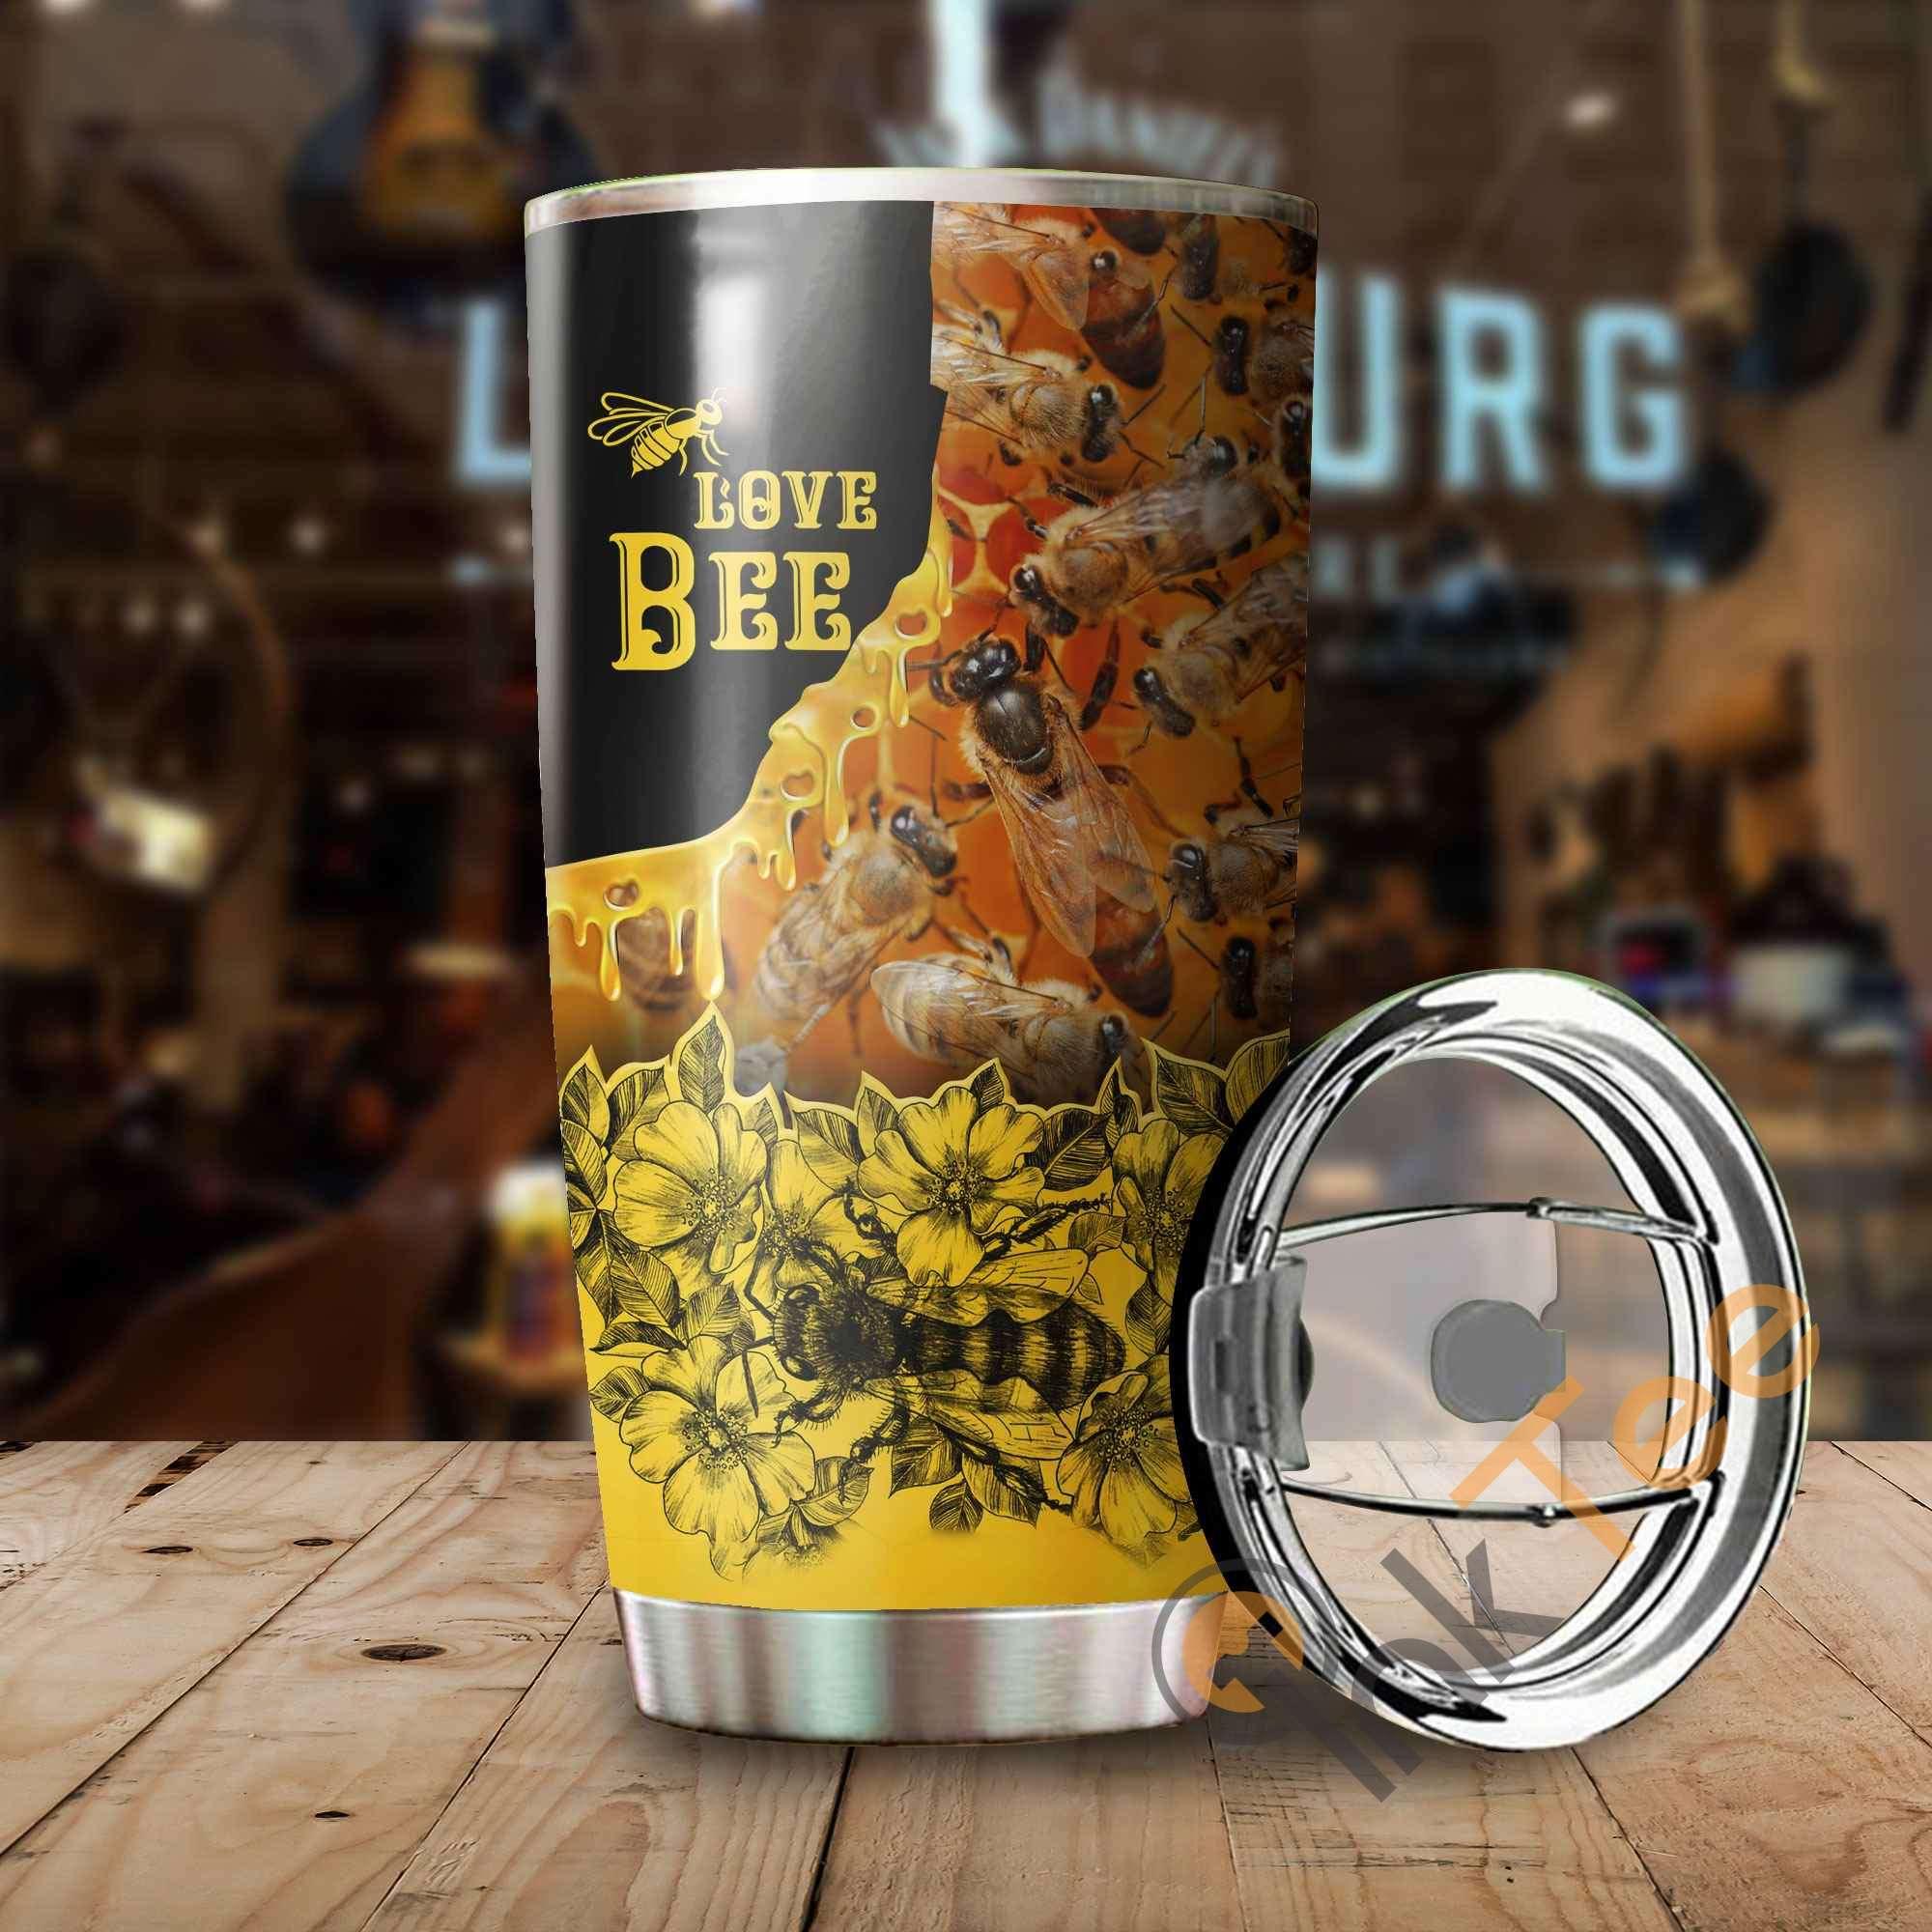 Bee Honey Amazon Best Seller Sku 2653 Stainless Steel Tumbler